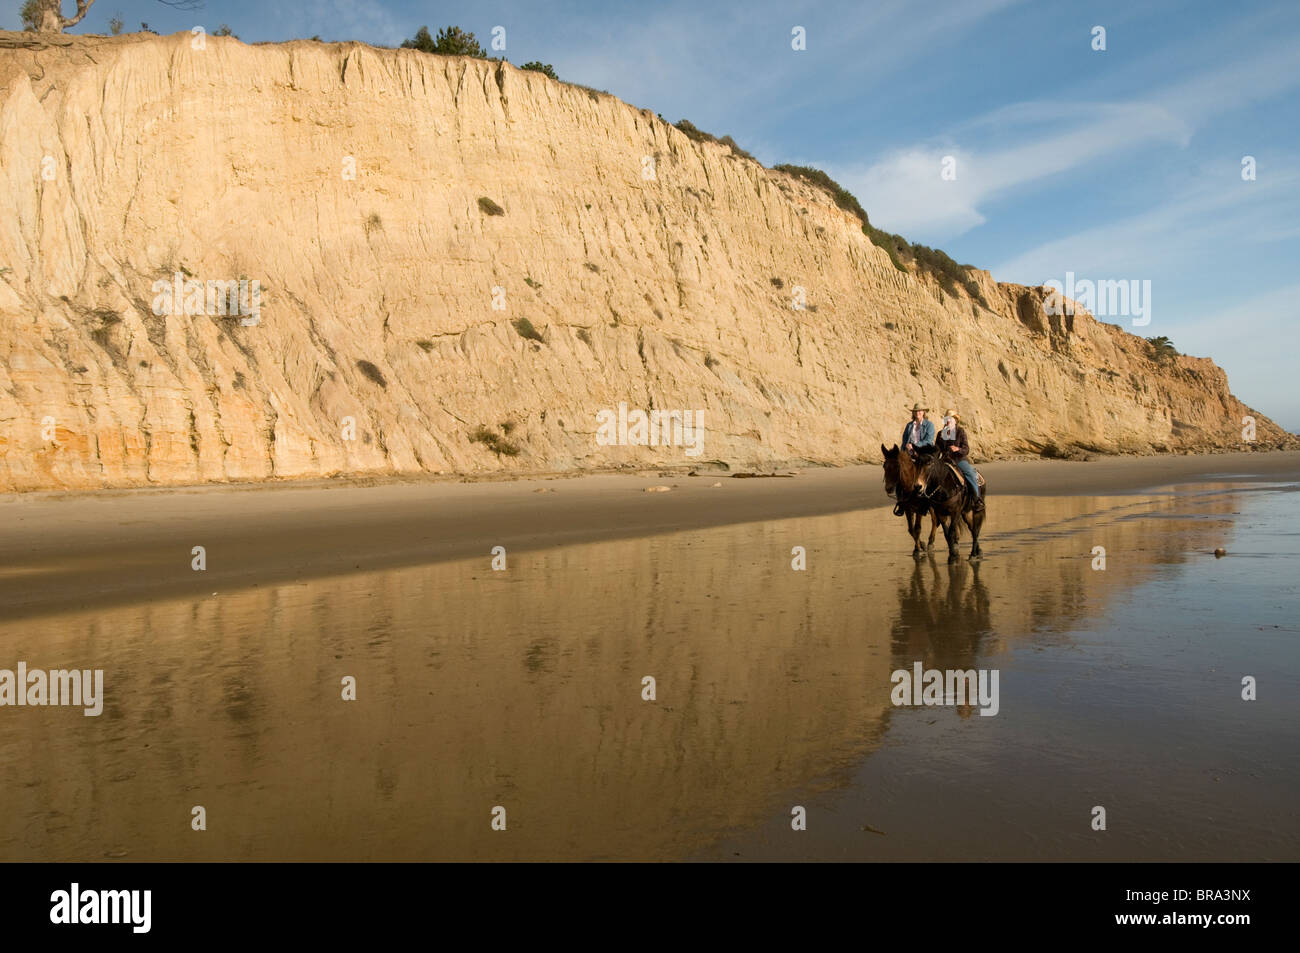 Mule riders pass cliffs on beach at Summerland Santa Barbara Central California Coast USA - Stock Image